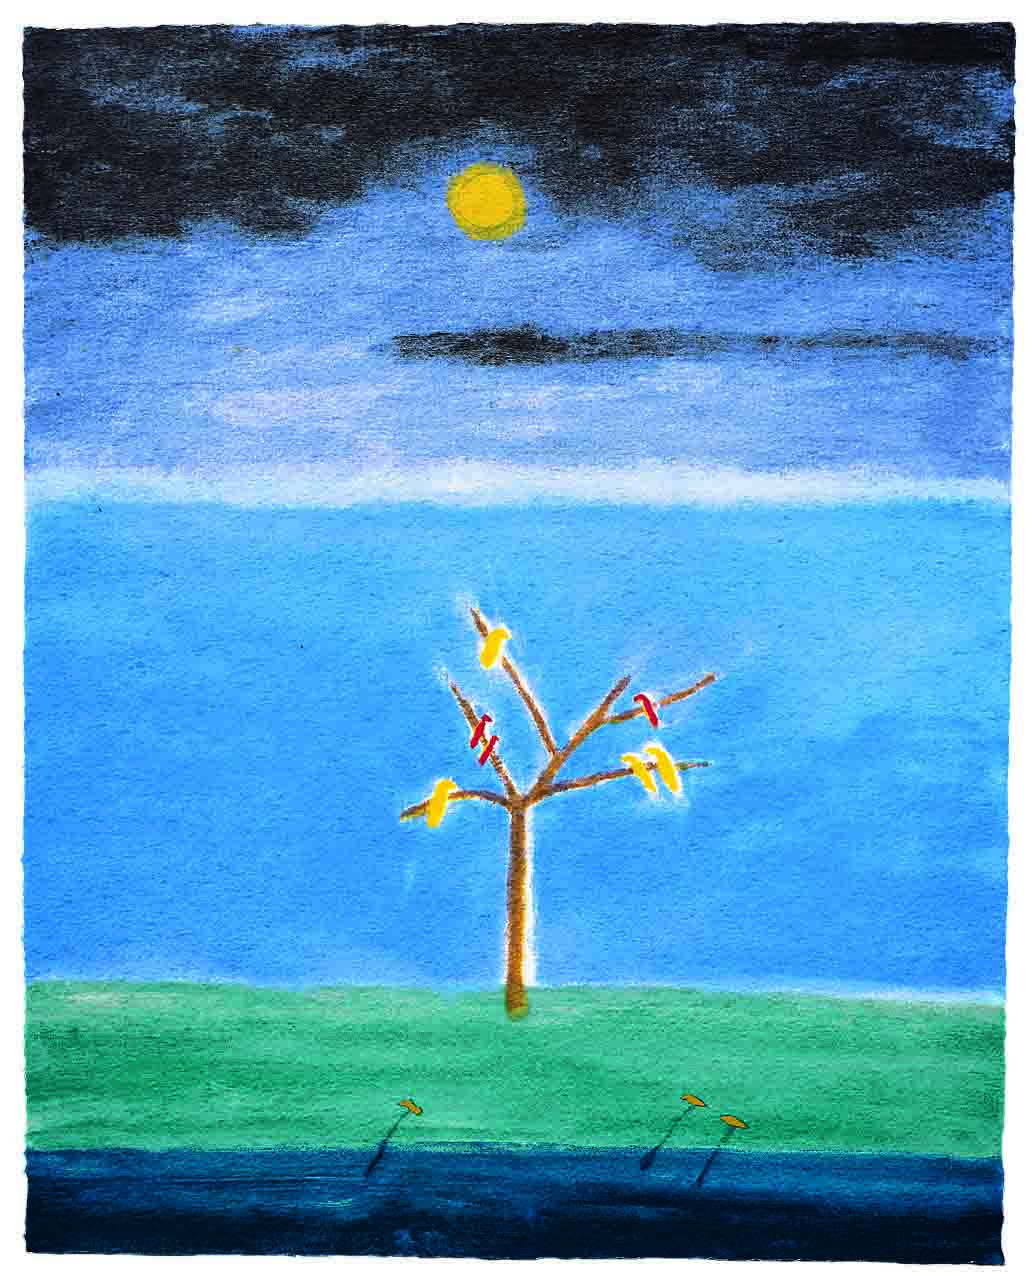 LOW Craigie Aitchison, Birds on a Tree, 2008.jpg